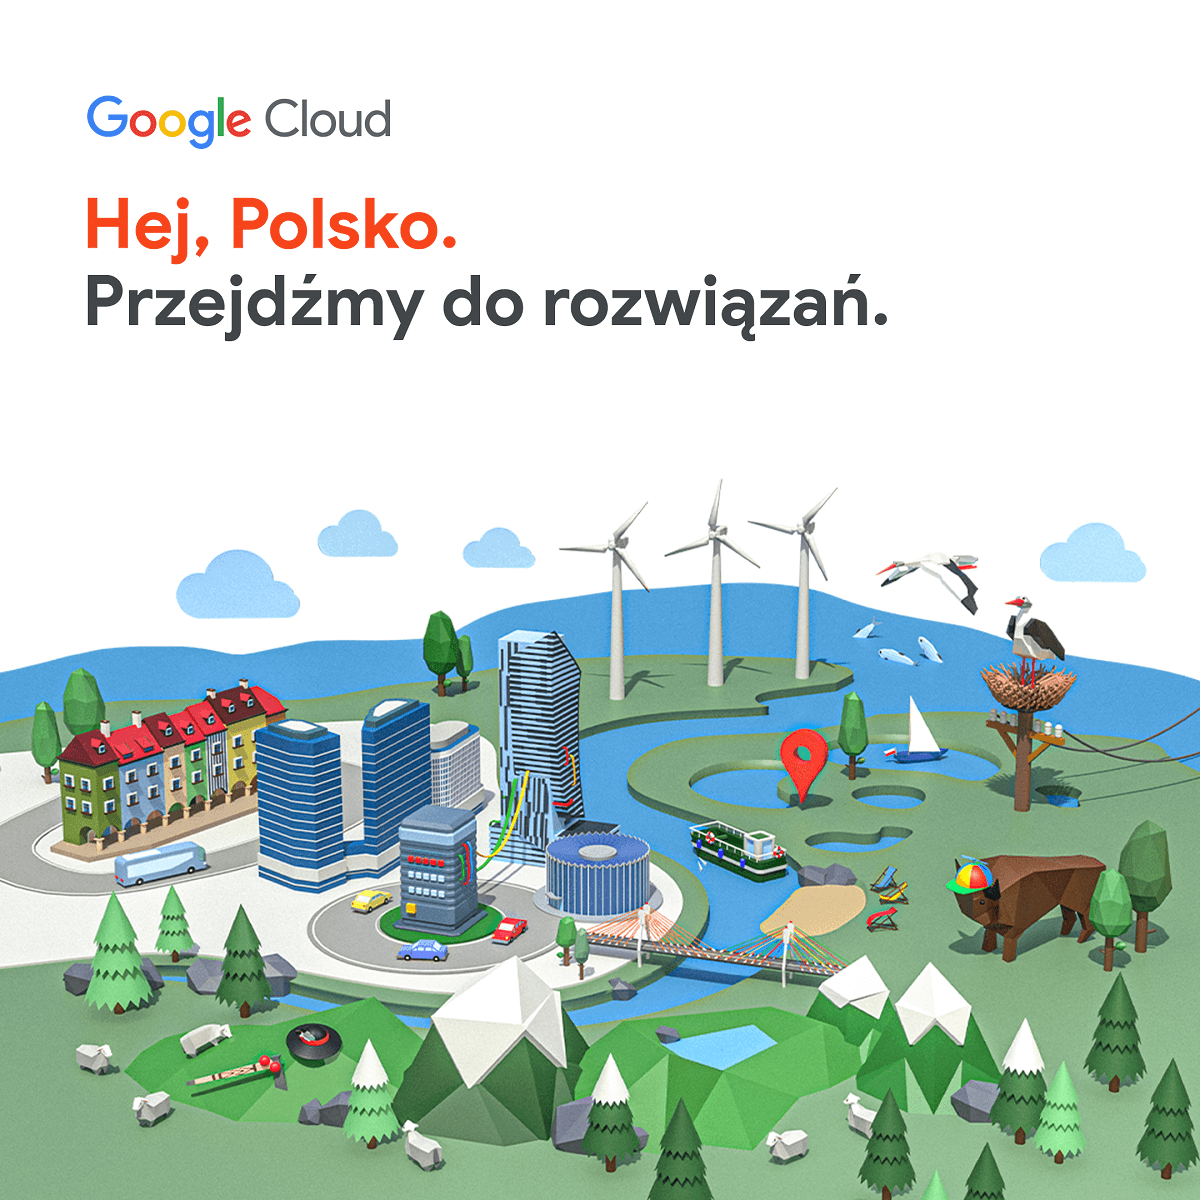 Google_Cloud_Warsaw_concept2_static_1x1